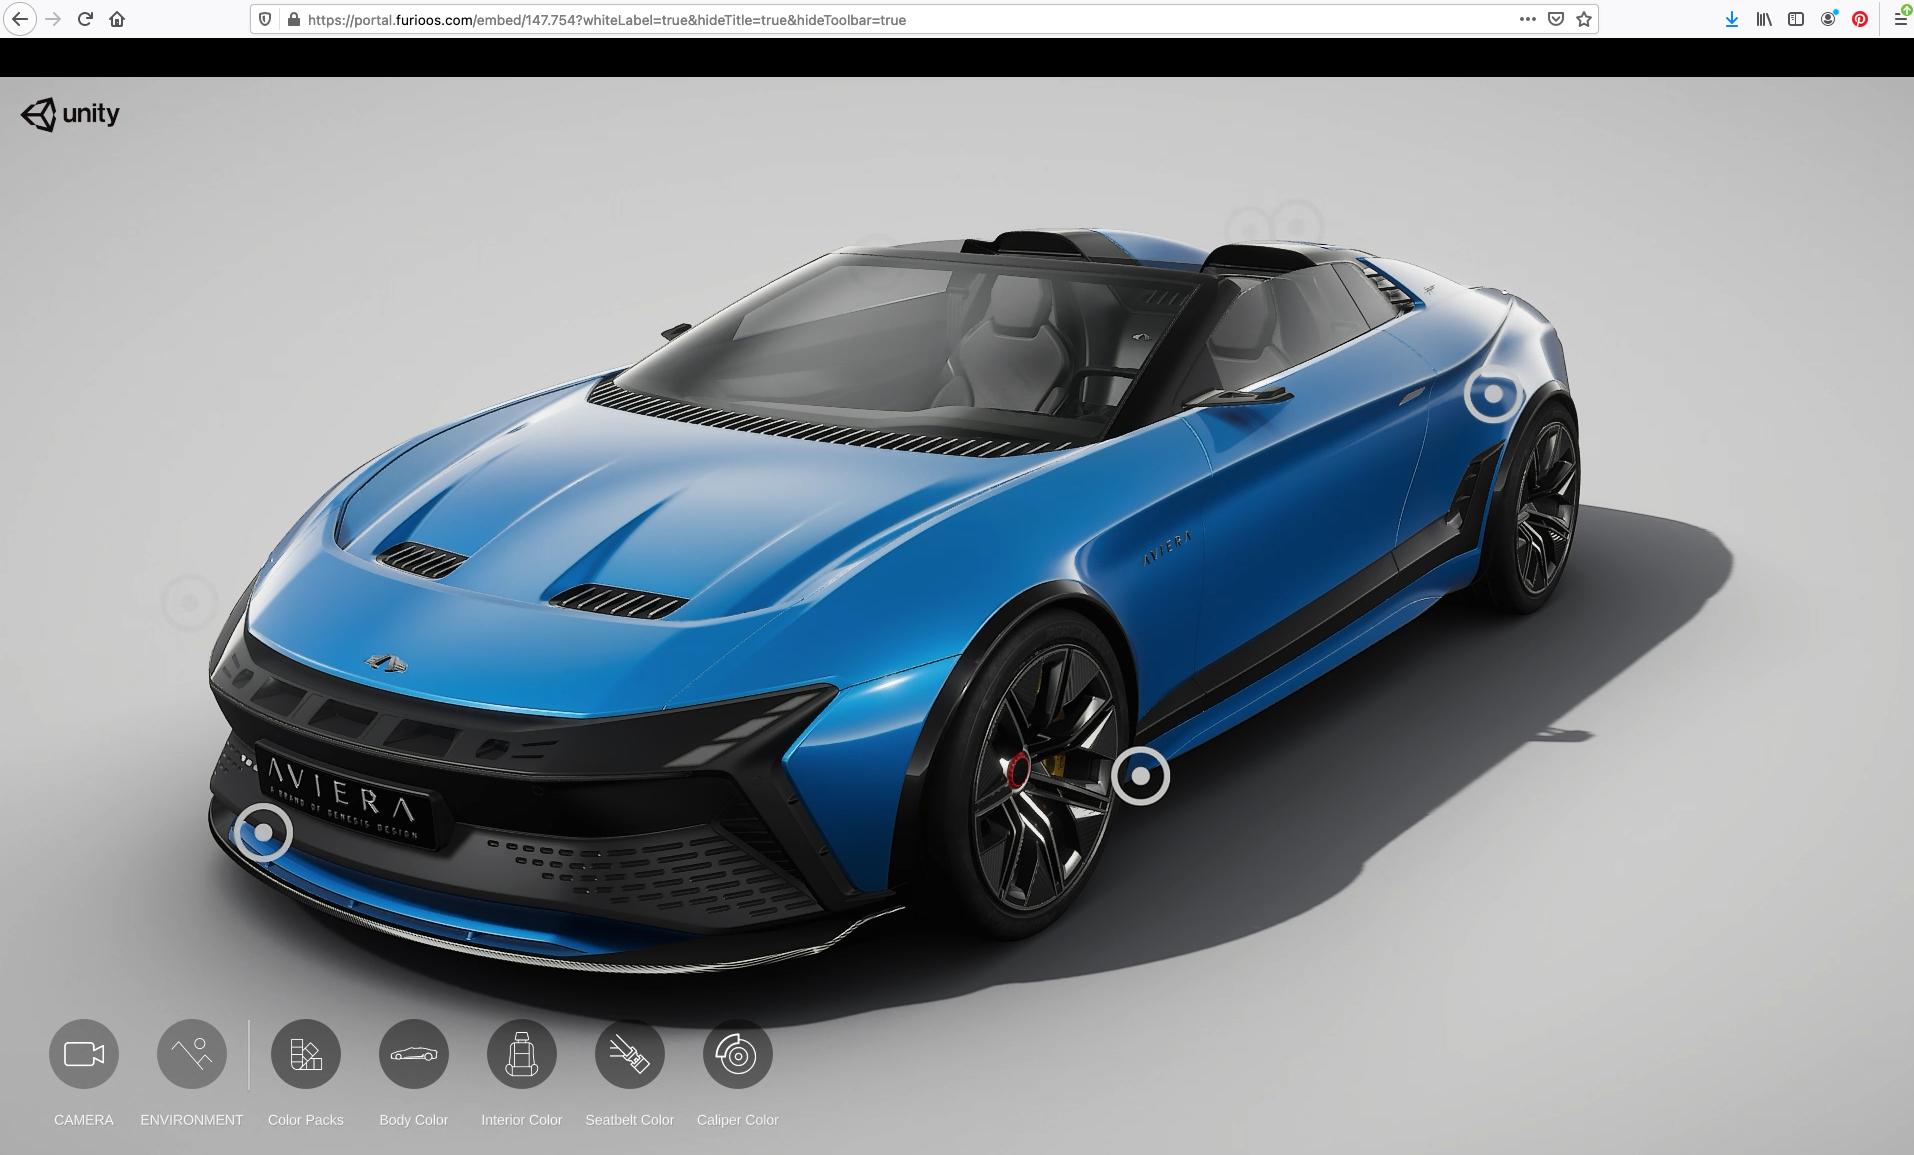 Blauersportwagen Cloudstream